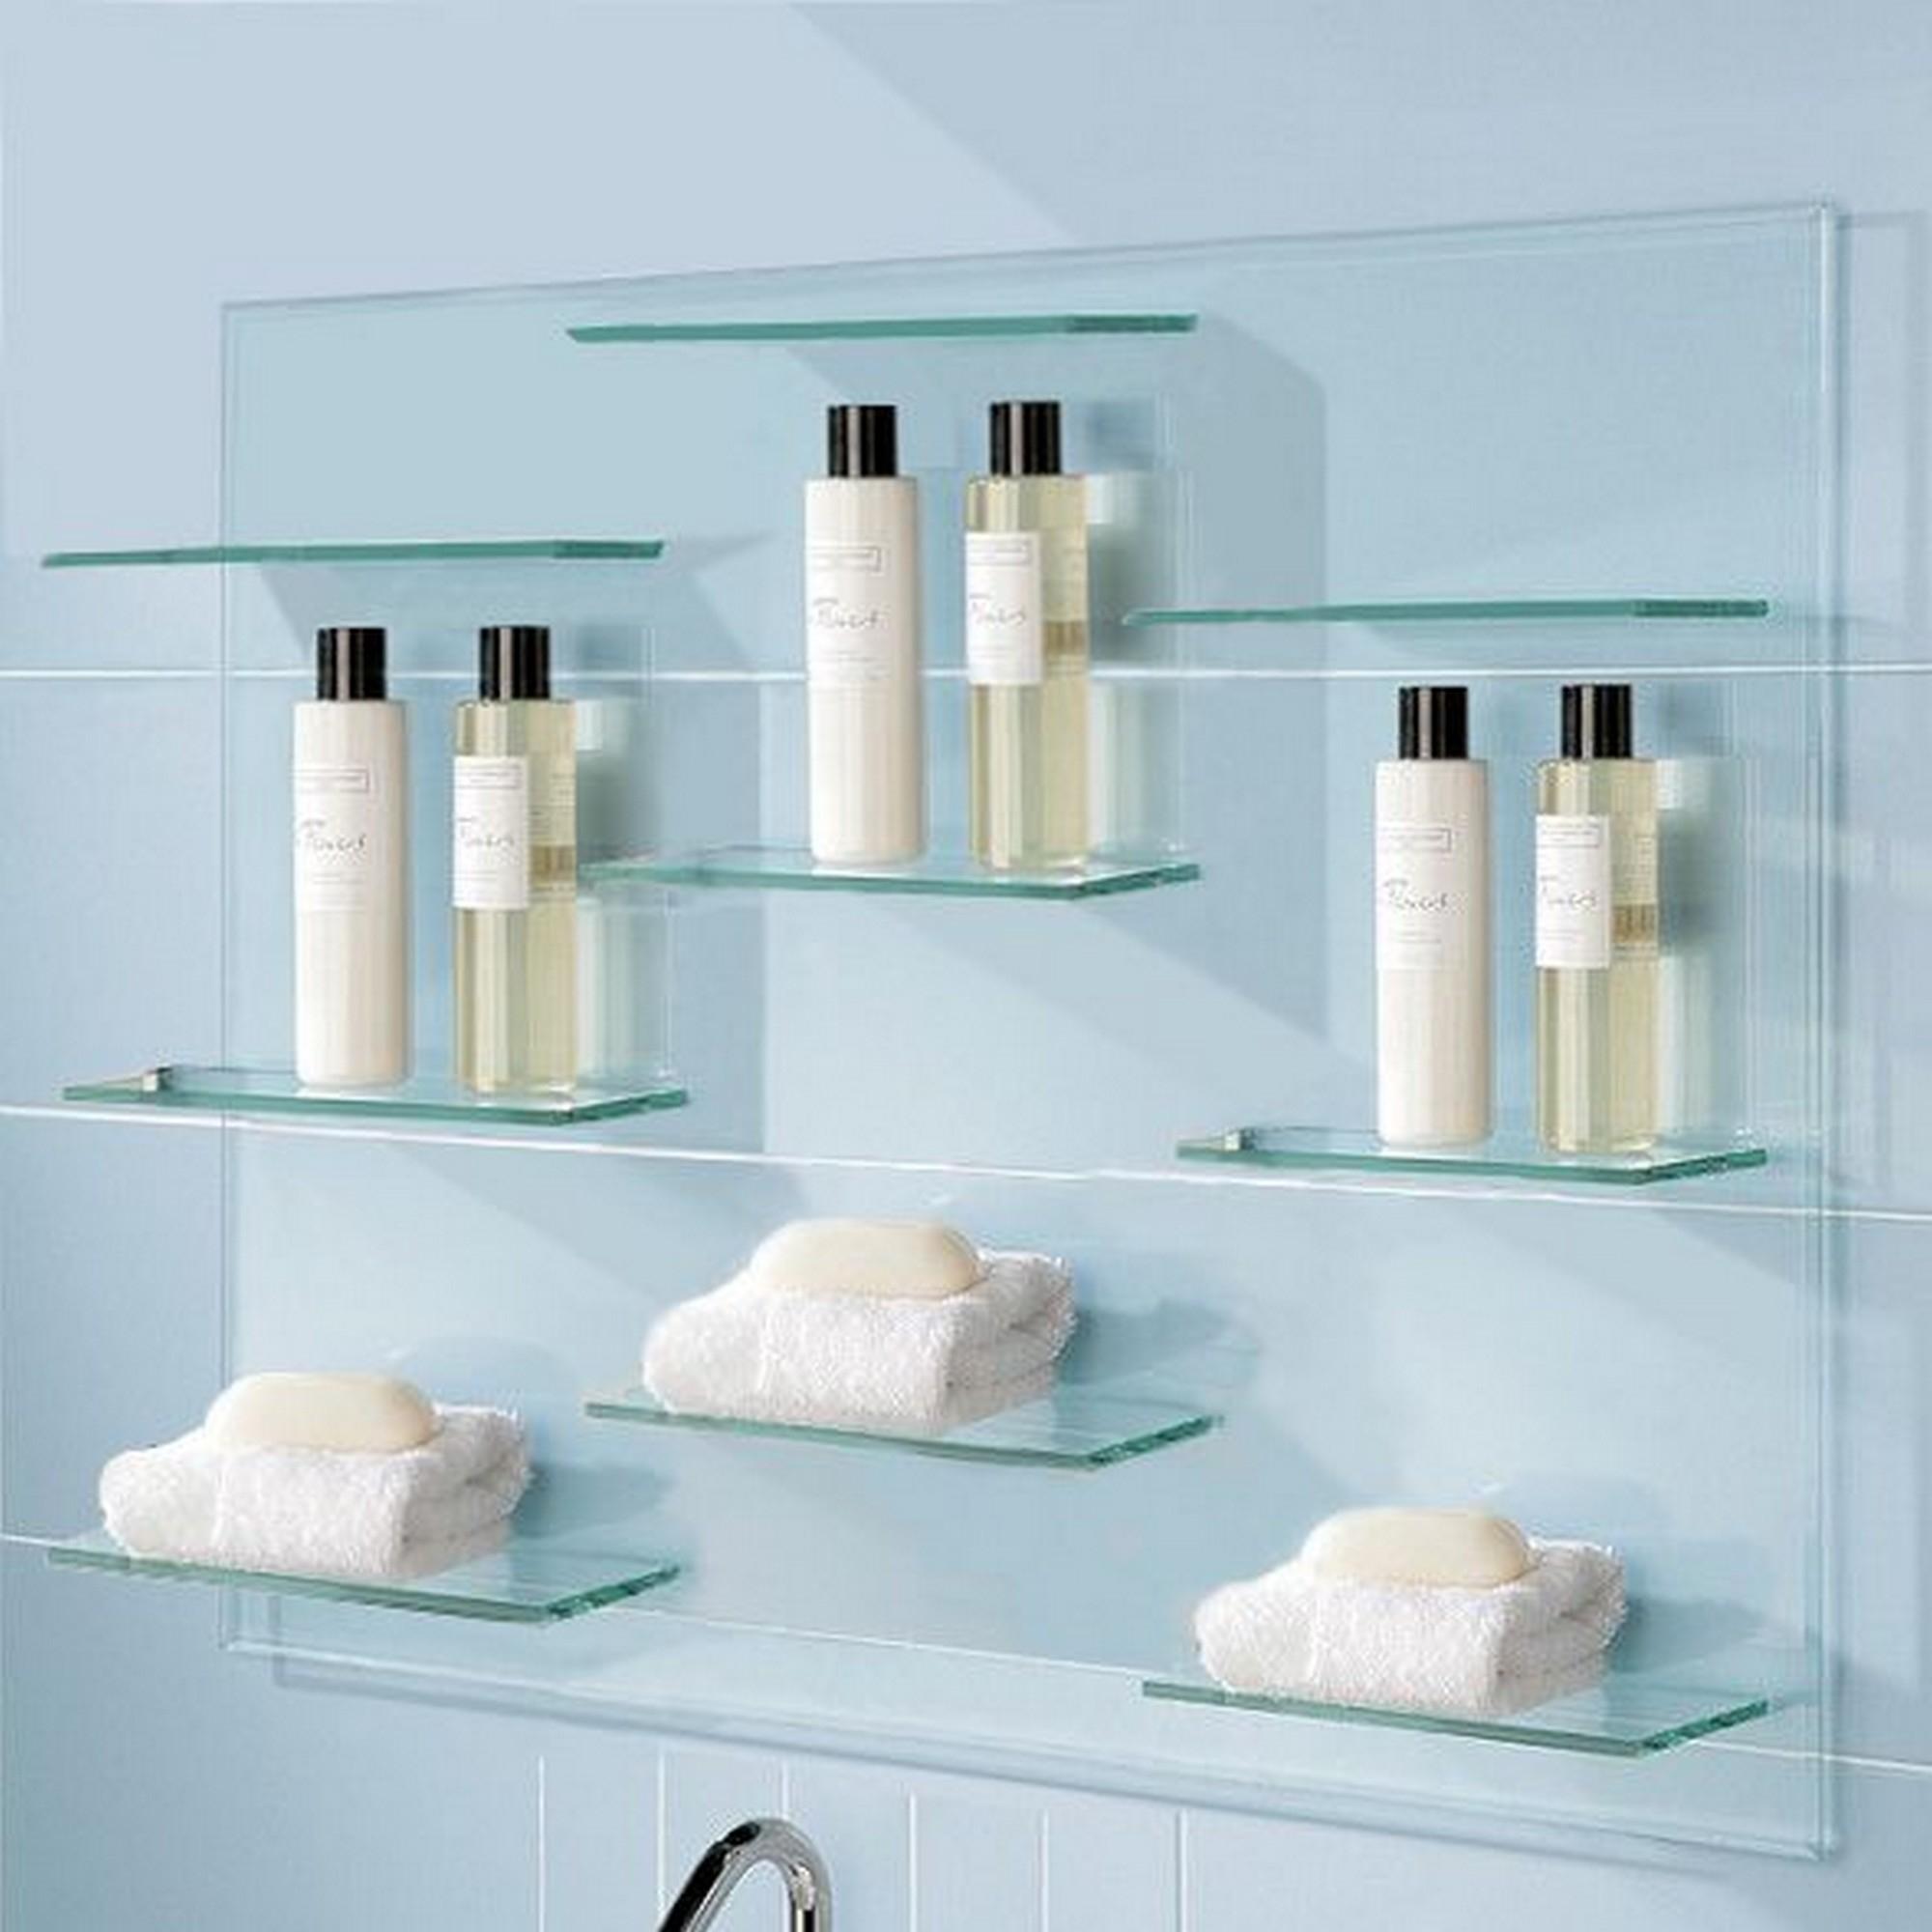 Floating Glass Shelves With Elegant Design For Clean Bathroom Inside Floating Glass Shelves (Image 7 of 15)